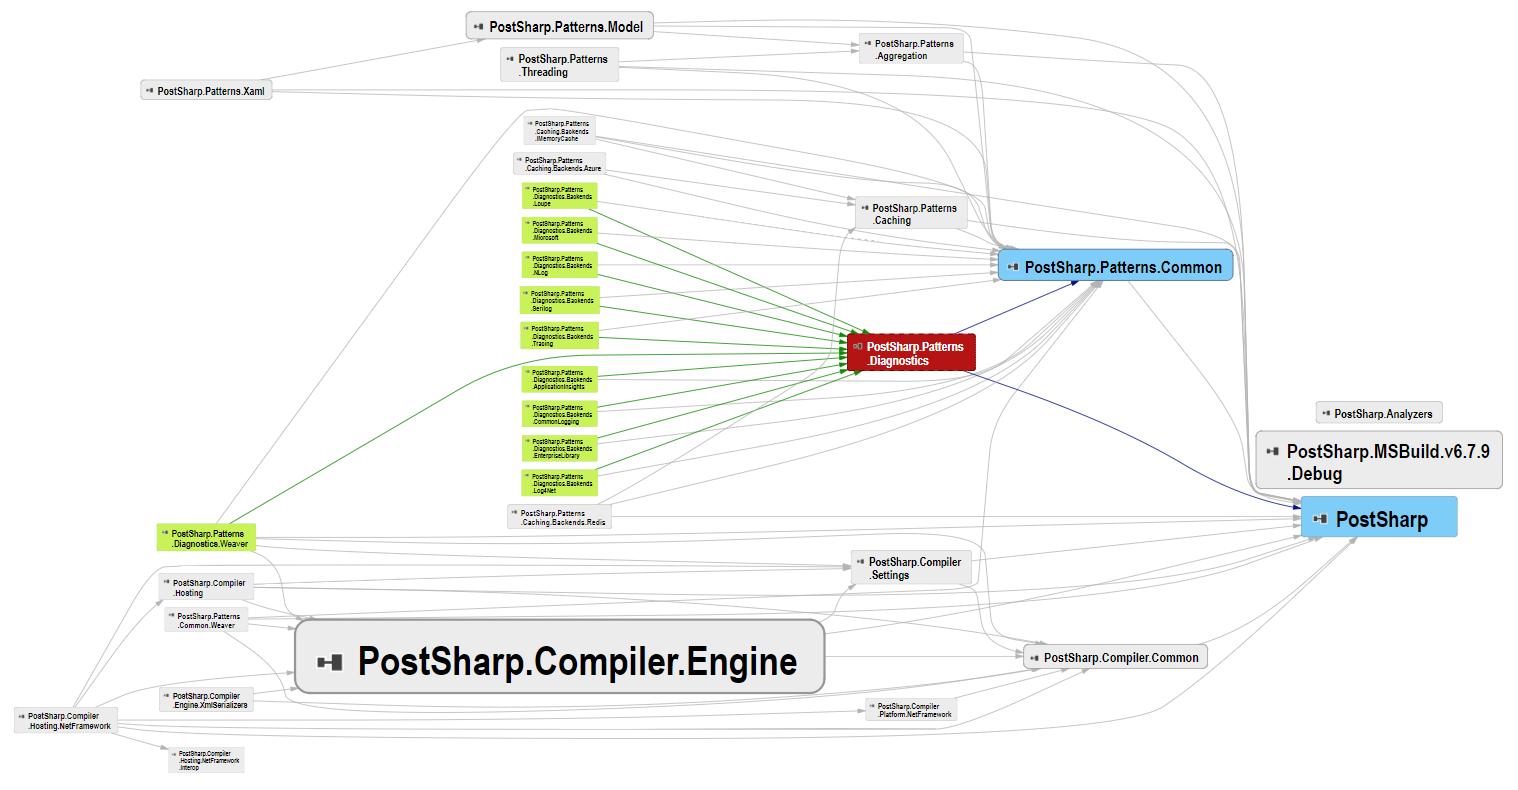 Postsharp Components Dependency Graph